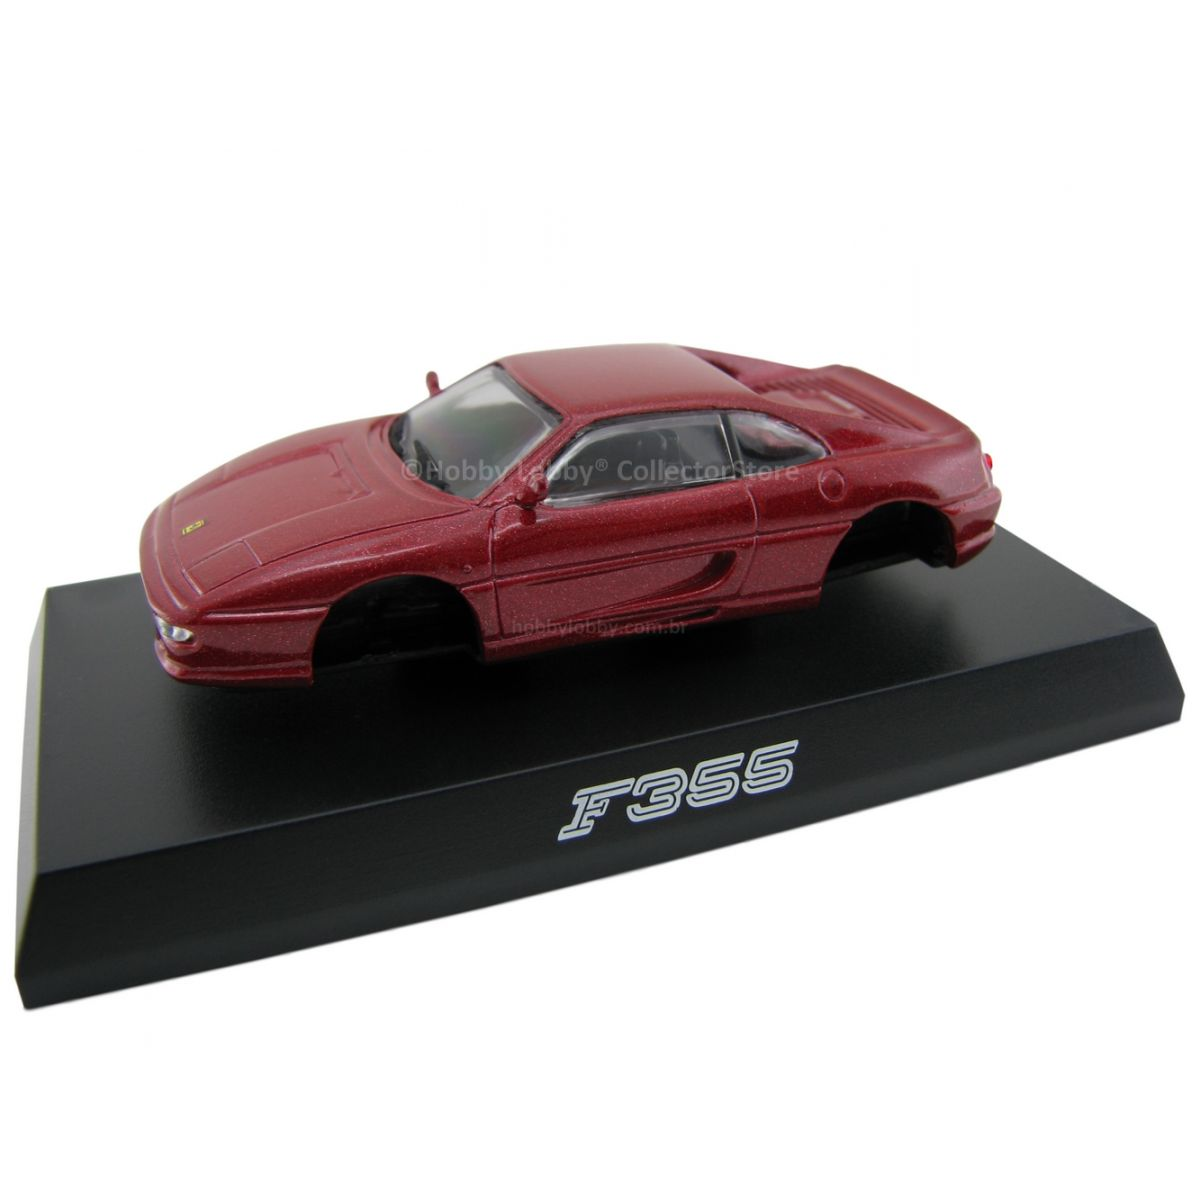 Kyosho - Ferrari Minicar Collection II - Ferrari F355 (vermelho metálico)  - Hobby Lobby CollectorStore